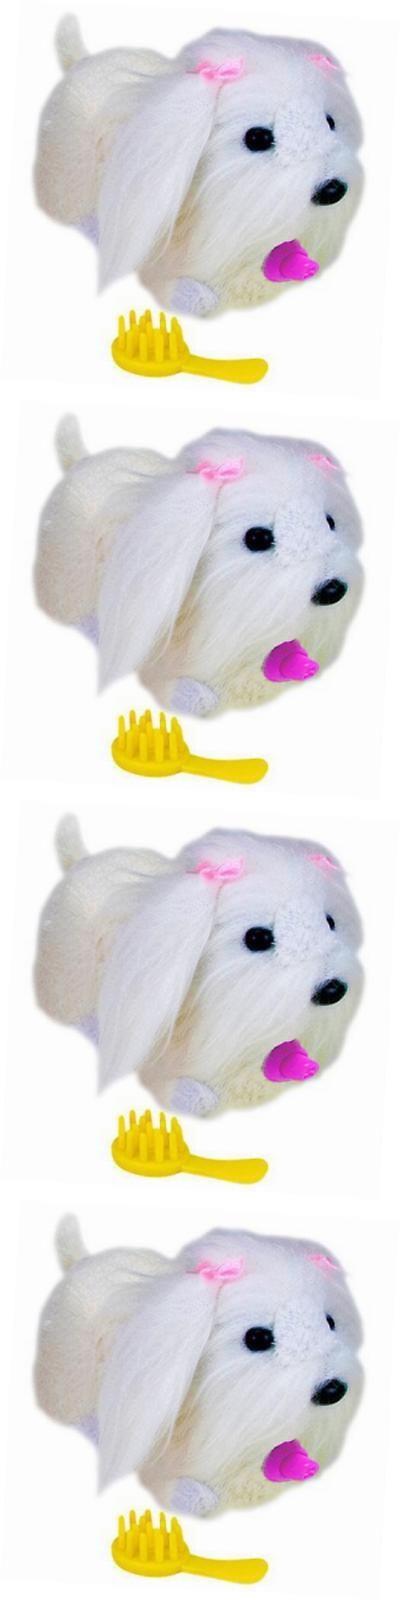 Zhu Zhu Pets 171529: Zhu Zhu Puppies Dog Sabrina - Maltese (White) -> BUY IT NOW ONLY: $49.97 on eBay!